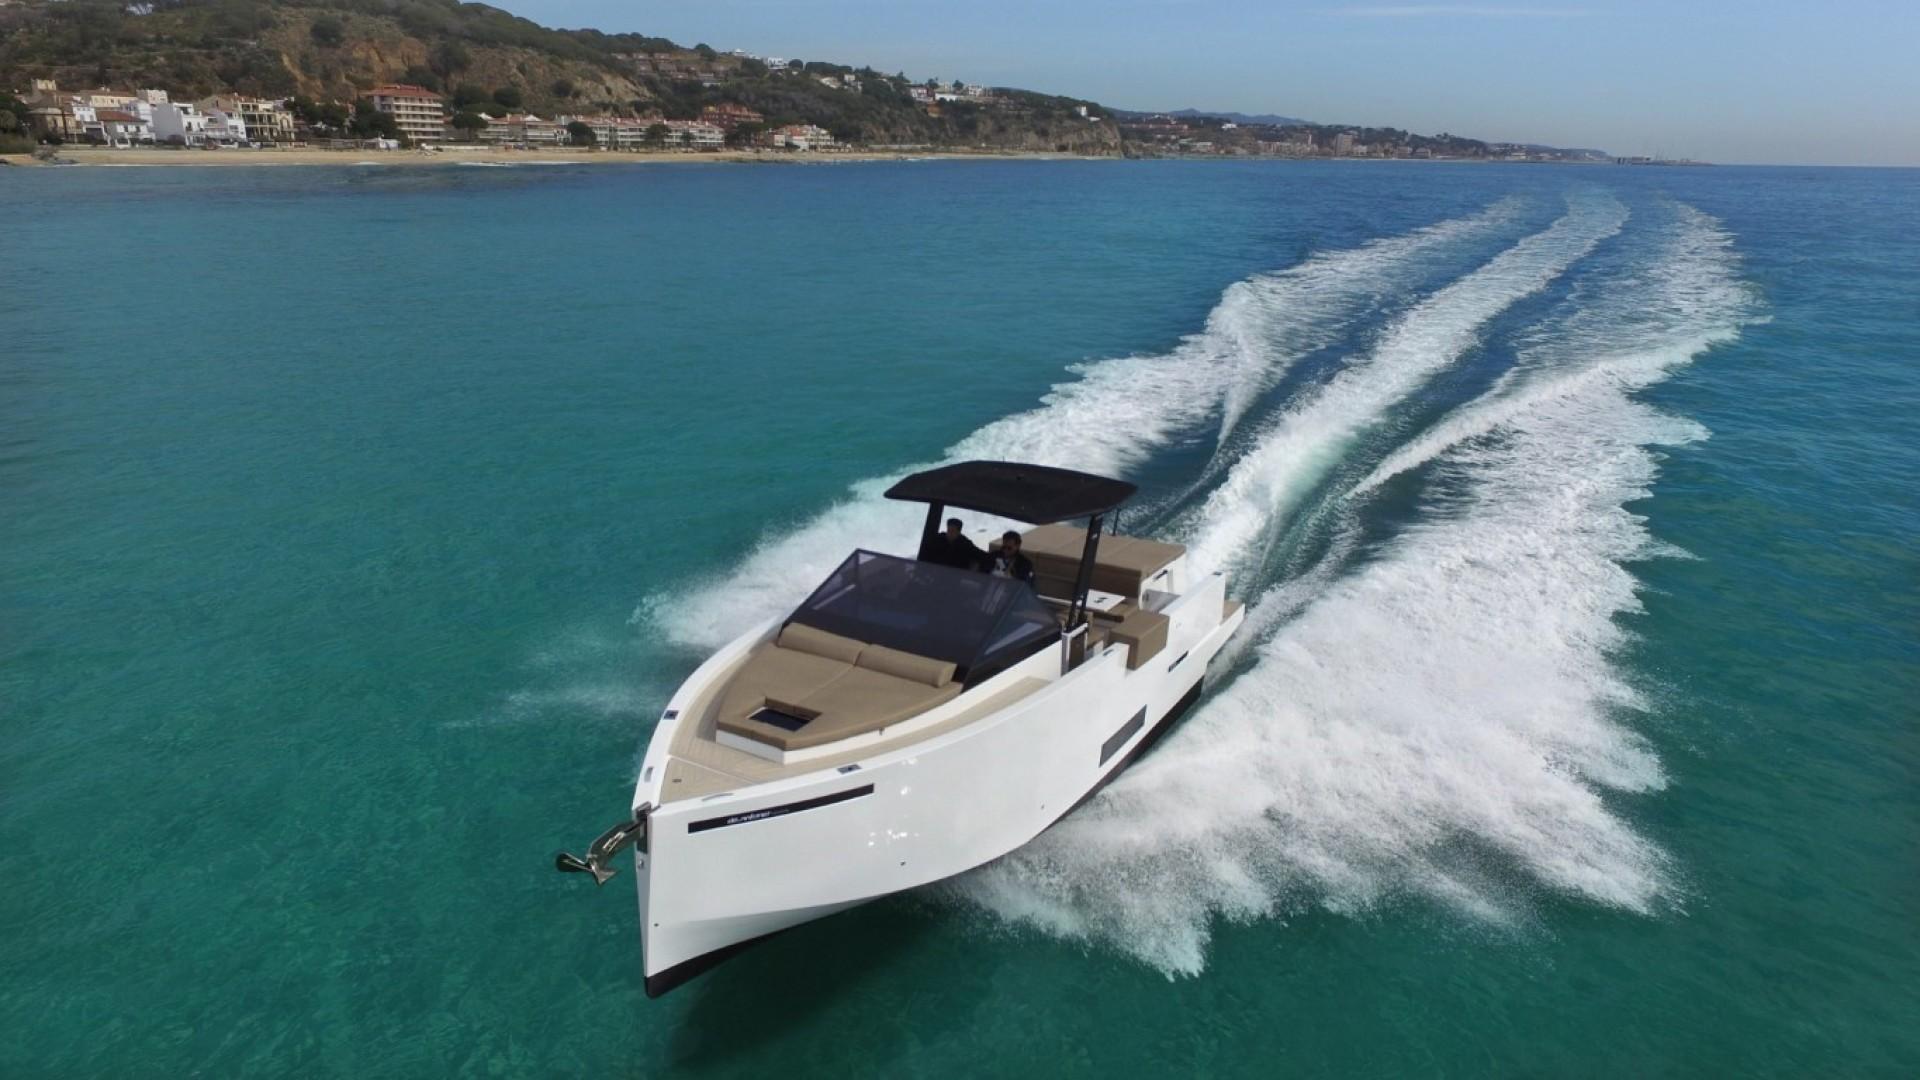 De Antonio-D34 Cruiser 2020-De Antonio Yachts D34 Cruiser Fort Lauderdale-Florida-United States-De Antonio Yachts_D34 Cruiser_01-1549264 | Thumbnail